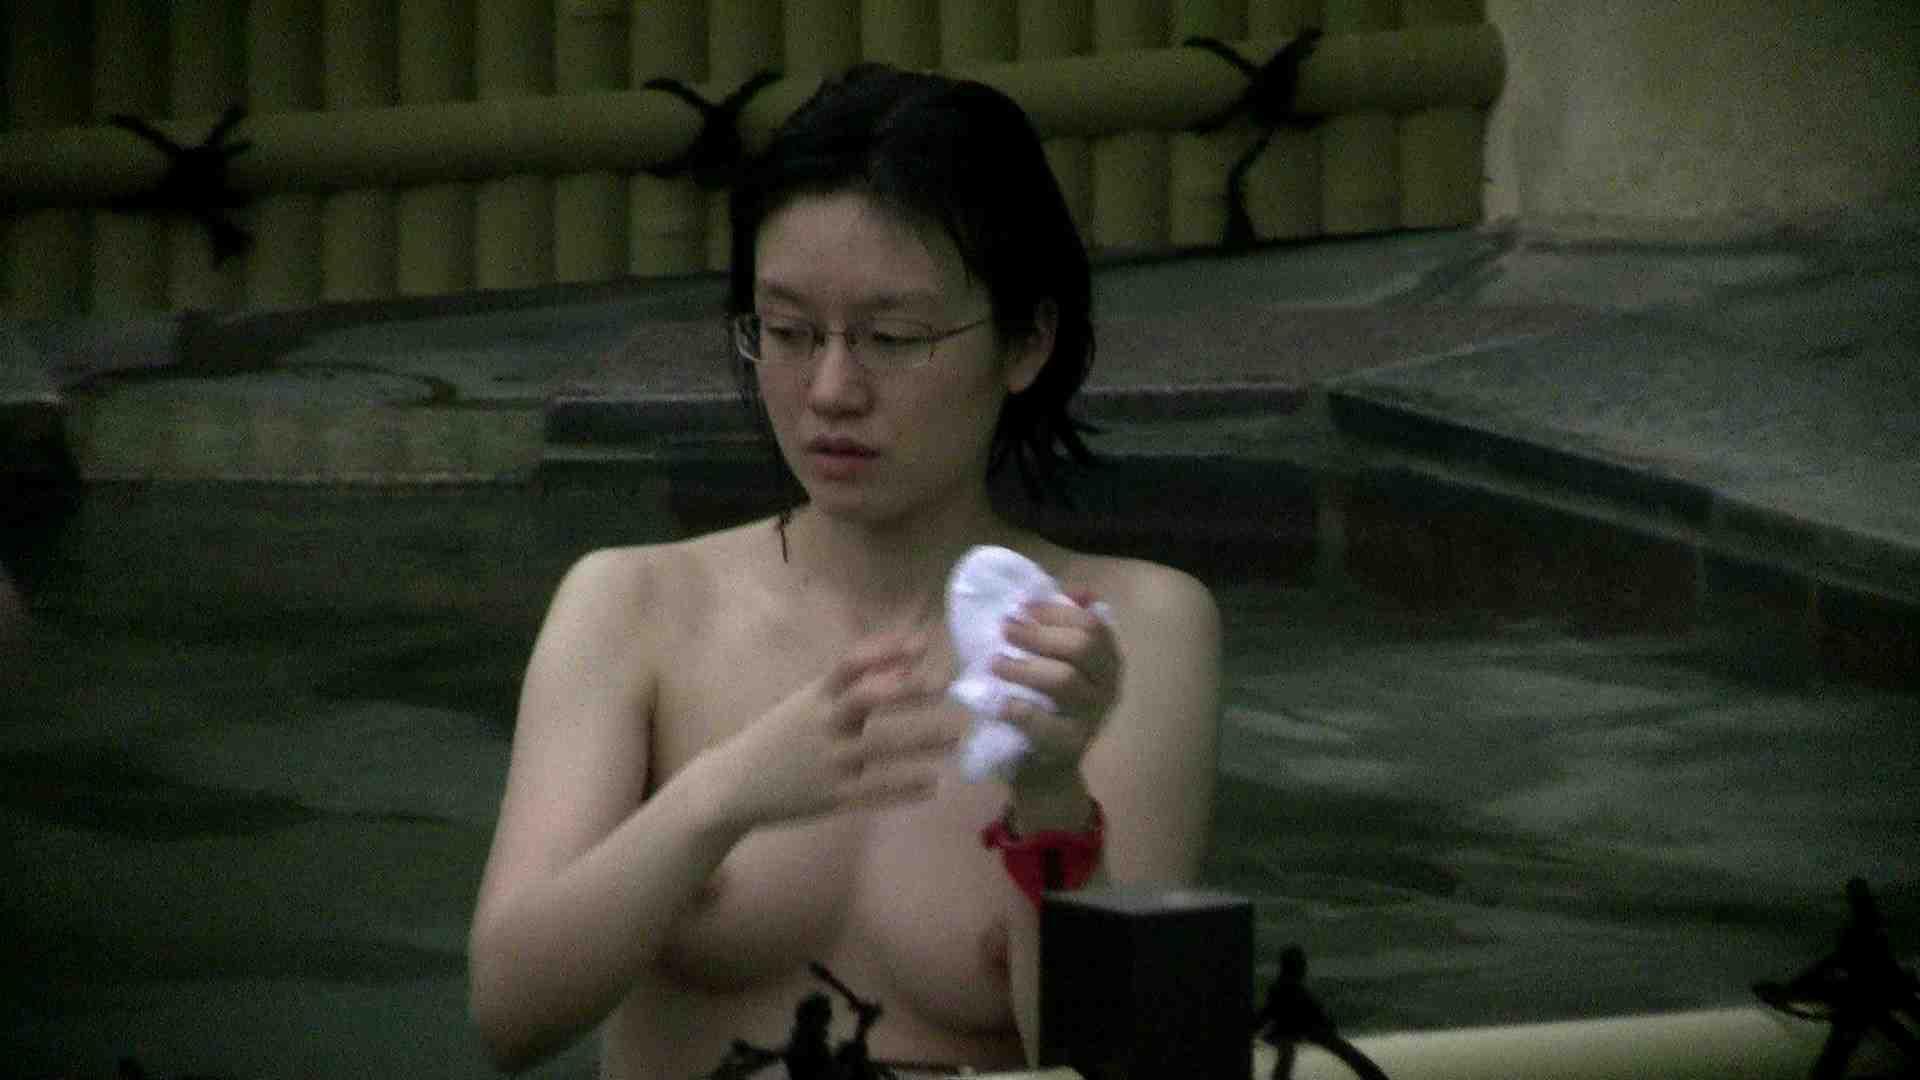 Aquaな露天風呂Vol.684 HなOL オメコ動画キャプチャ 87pic 58